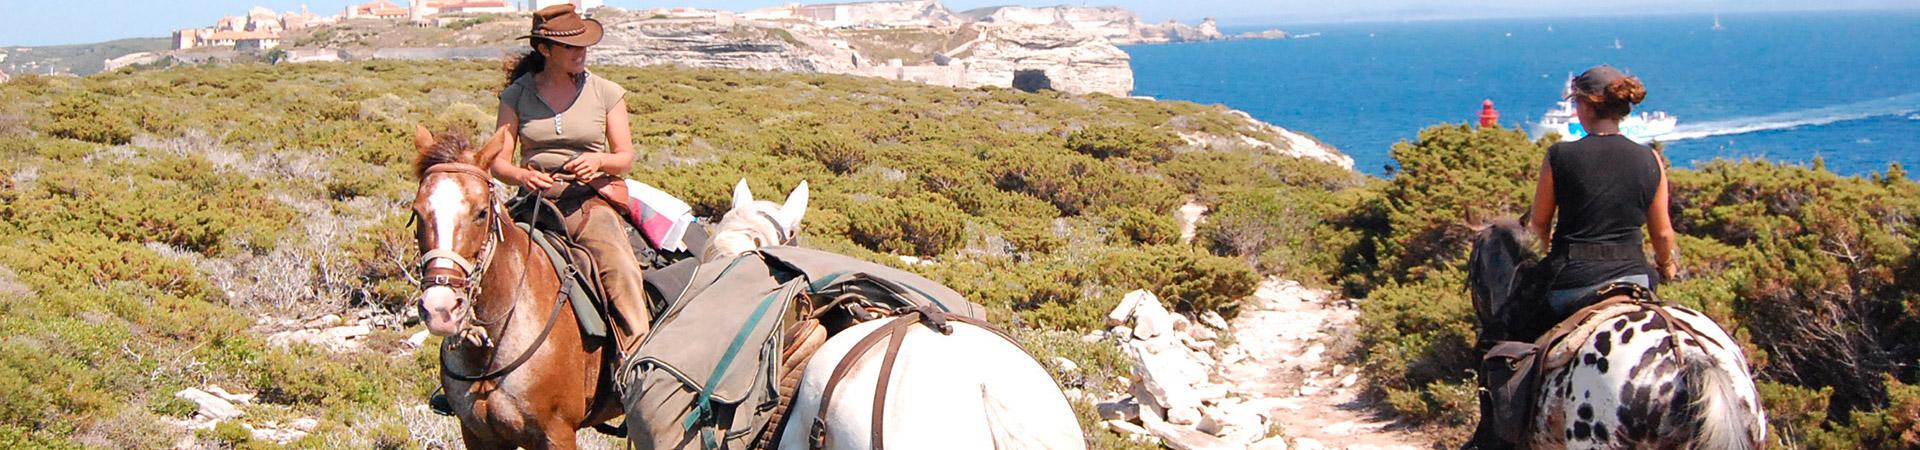 equitation-camping-merendella